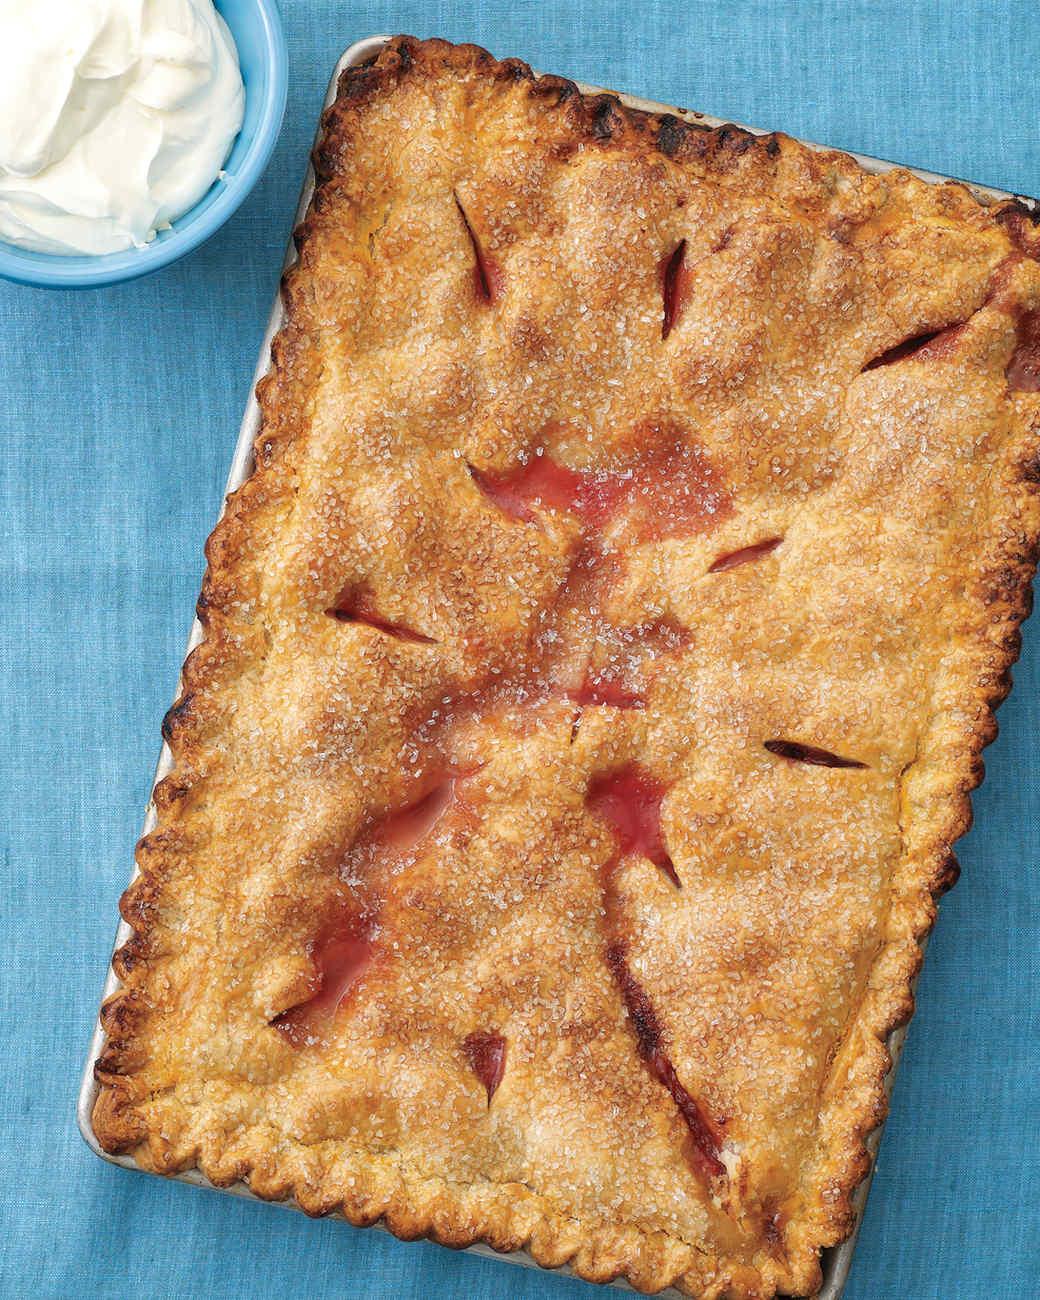 strawberry-rhubarb-slab-pie-med108164.jpg